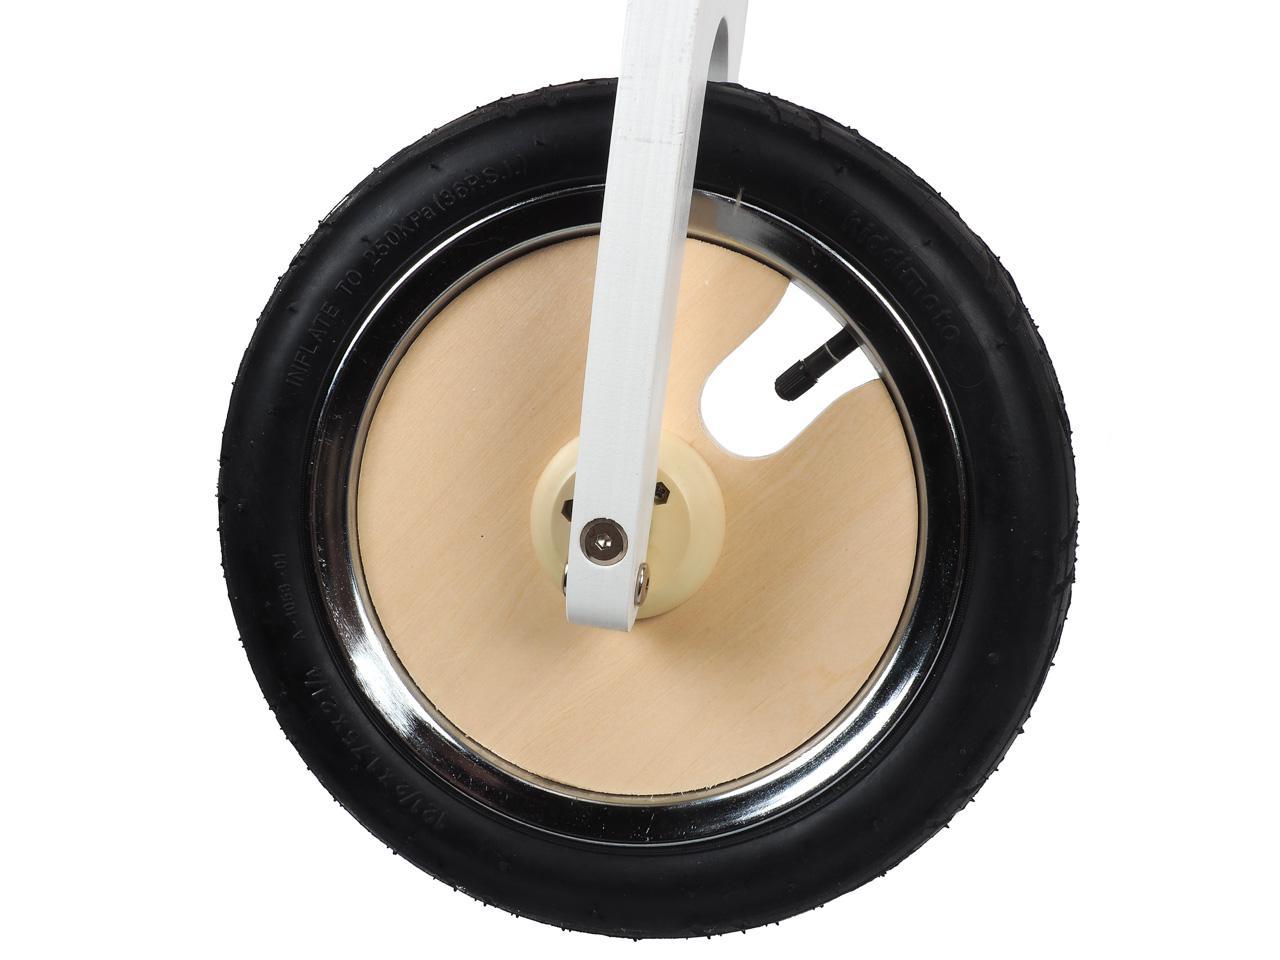 Bike-Icare-Distribution-Kiddi-Motorcycle-Kurve-Union-Ja-White-13165-New thumbnail 2